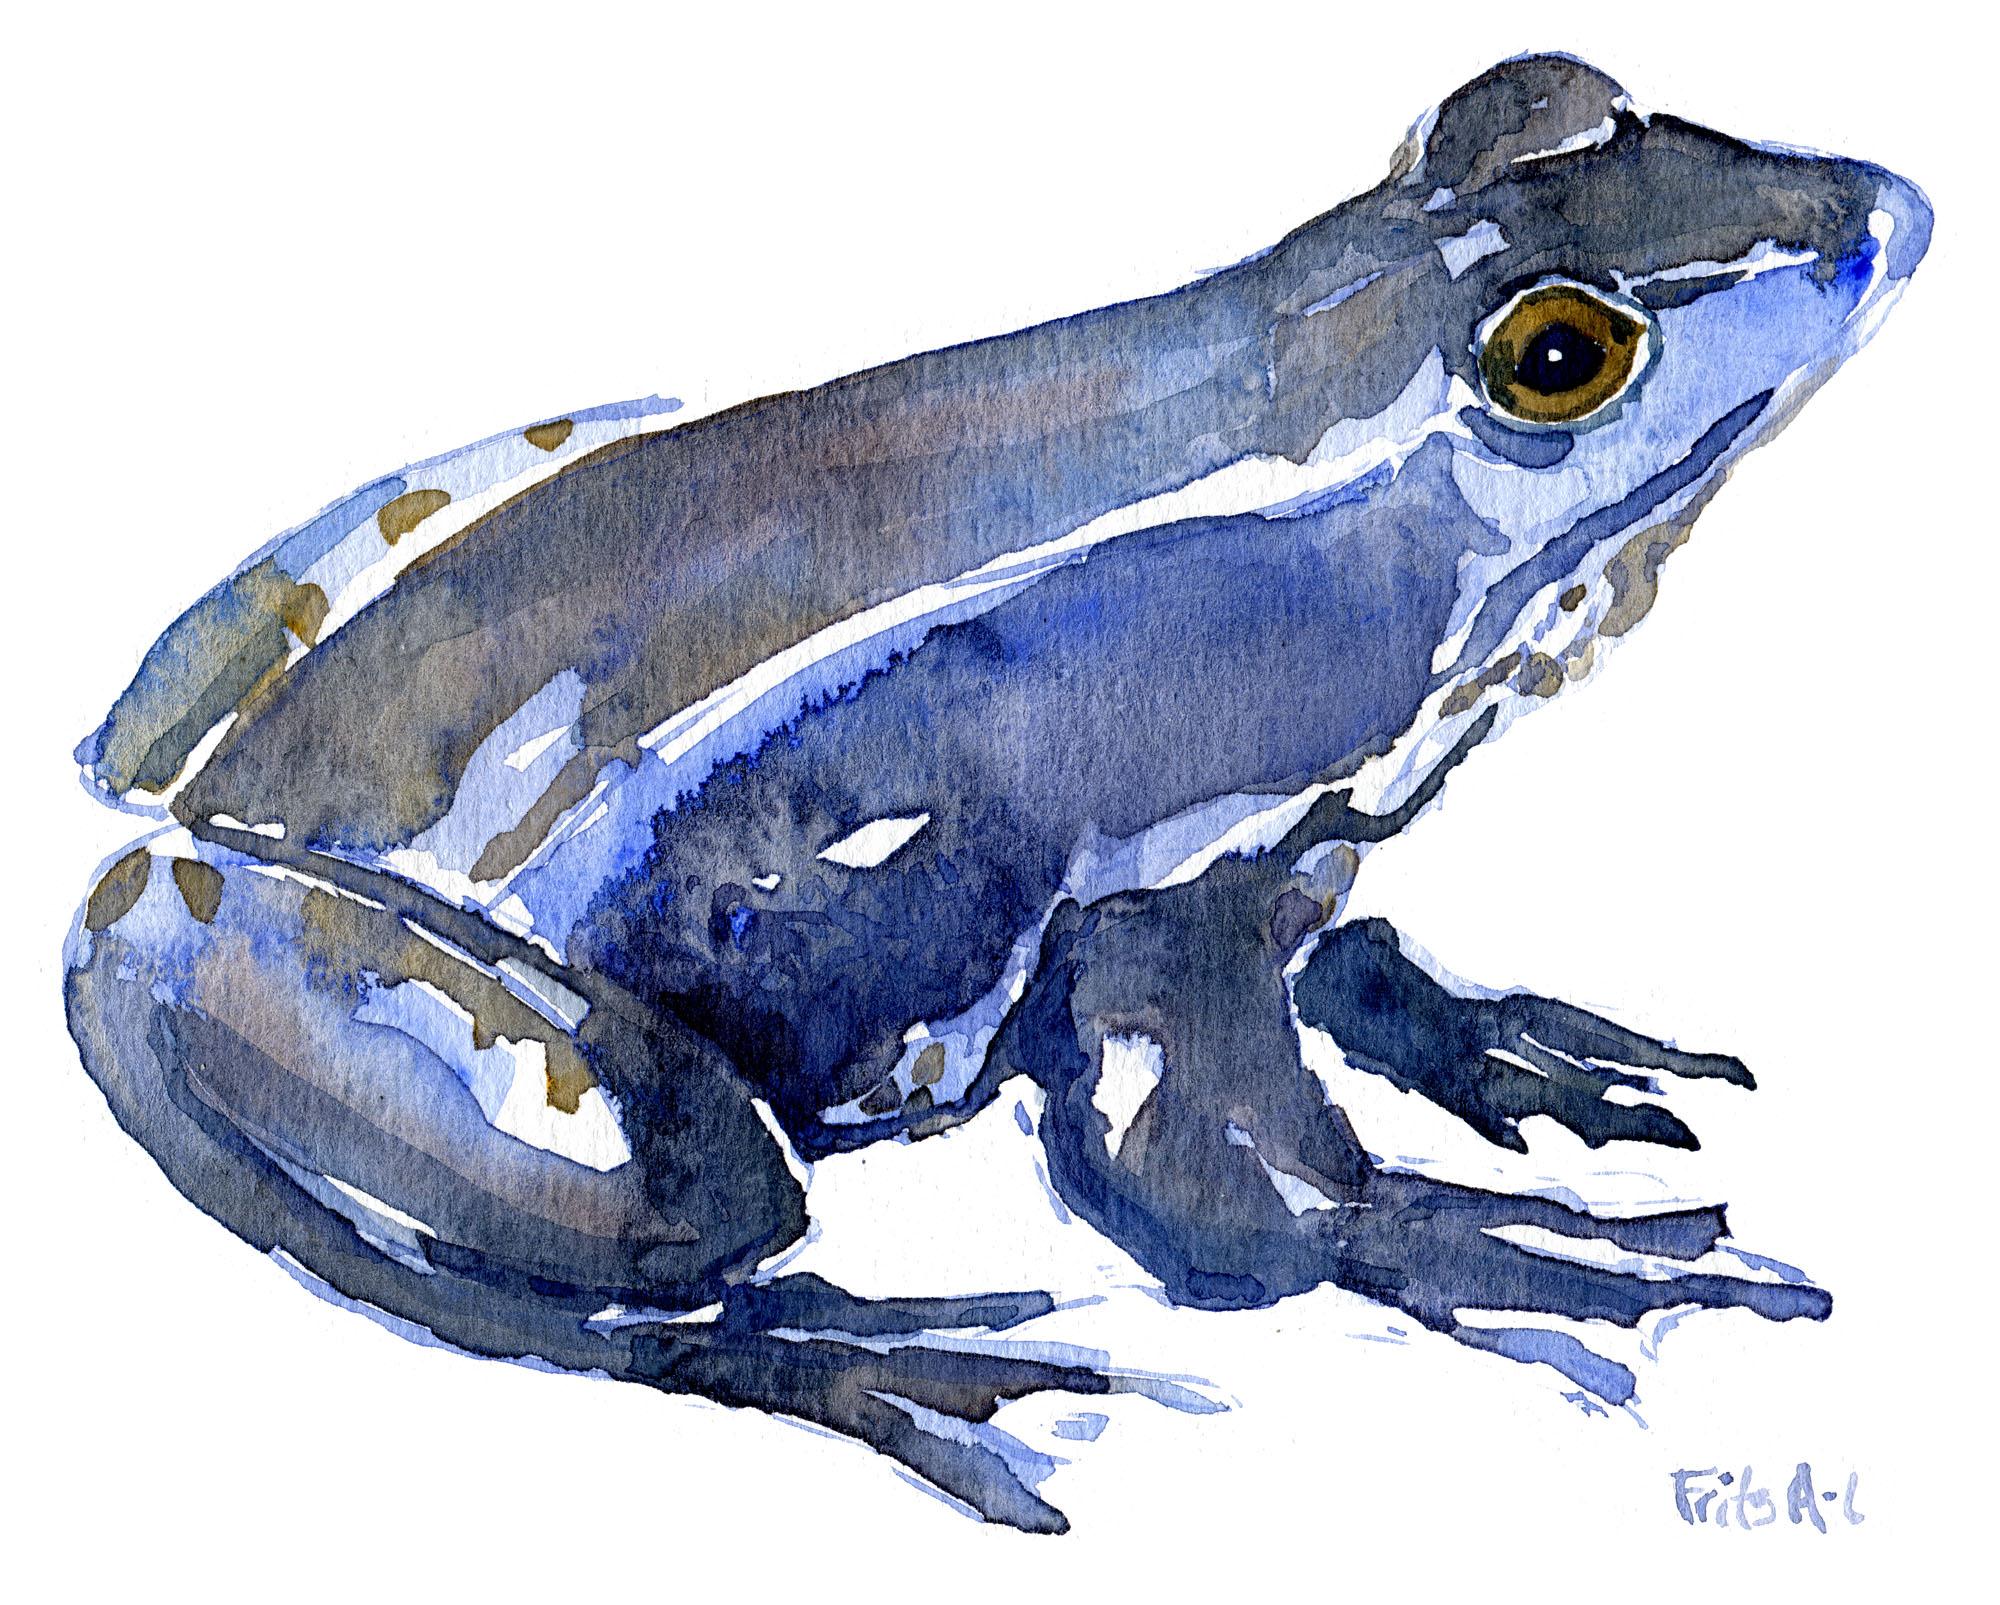 Spidssnudet frø i parringstid, blå variant. Akvarel